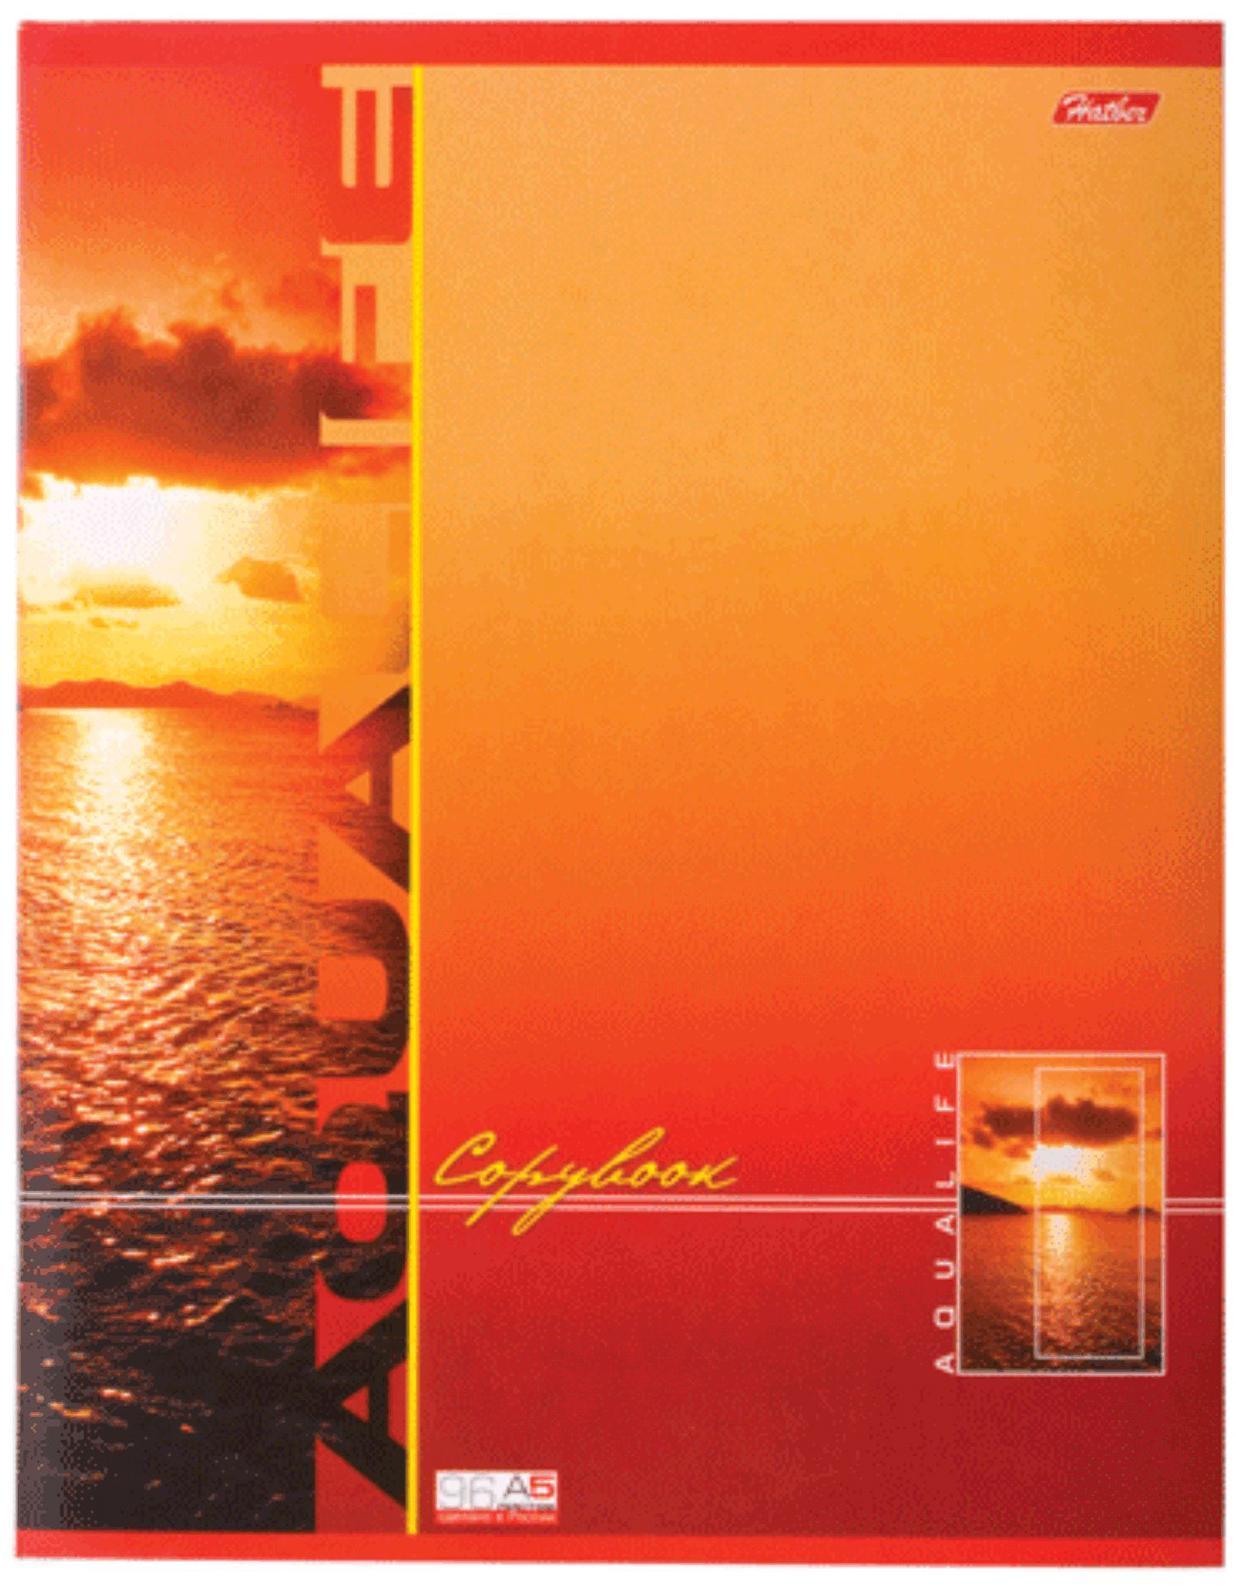 Тетрадь 96л А5ф клетка на скобе серия -Аквалайф-, цвет: оранжевый72523WD96Т5B1 Тетрадь 96л А5ф клетка на скобе серия -Аквалайф-, цвет: оранжевый